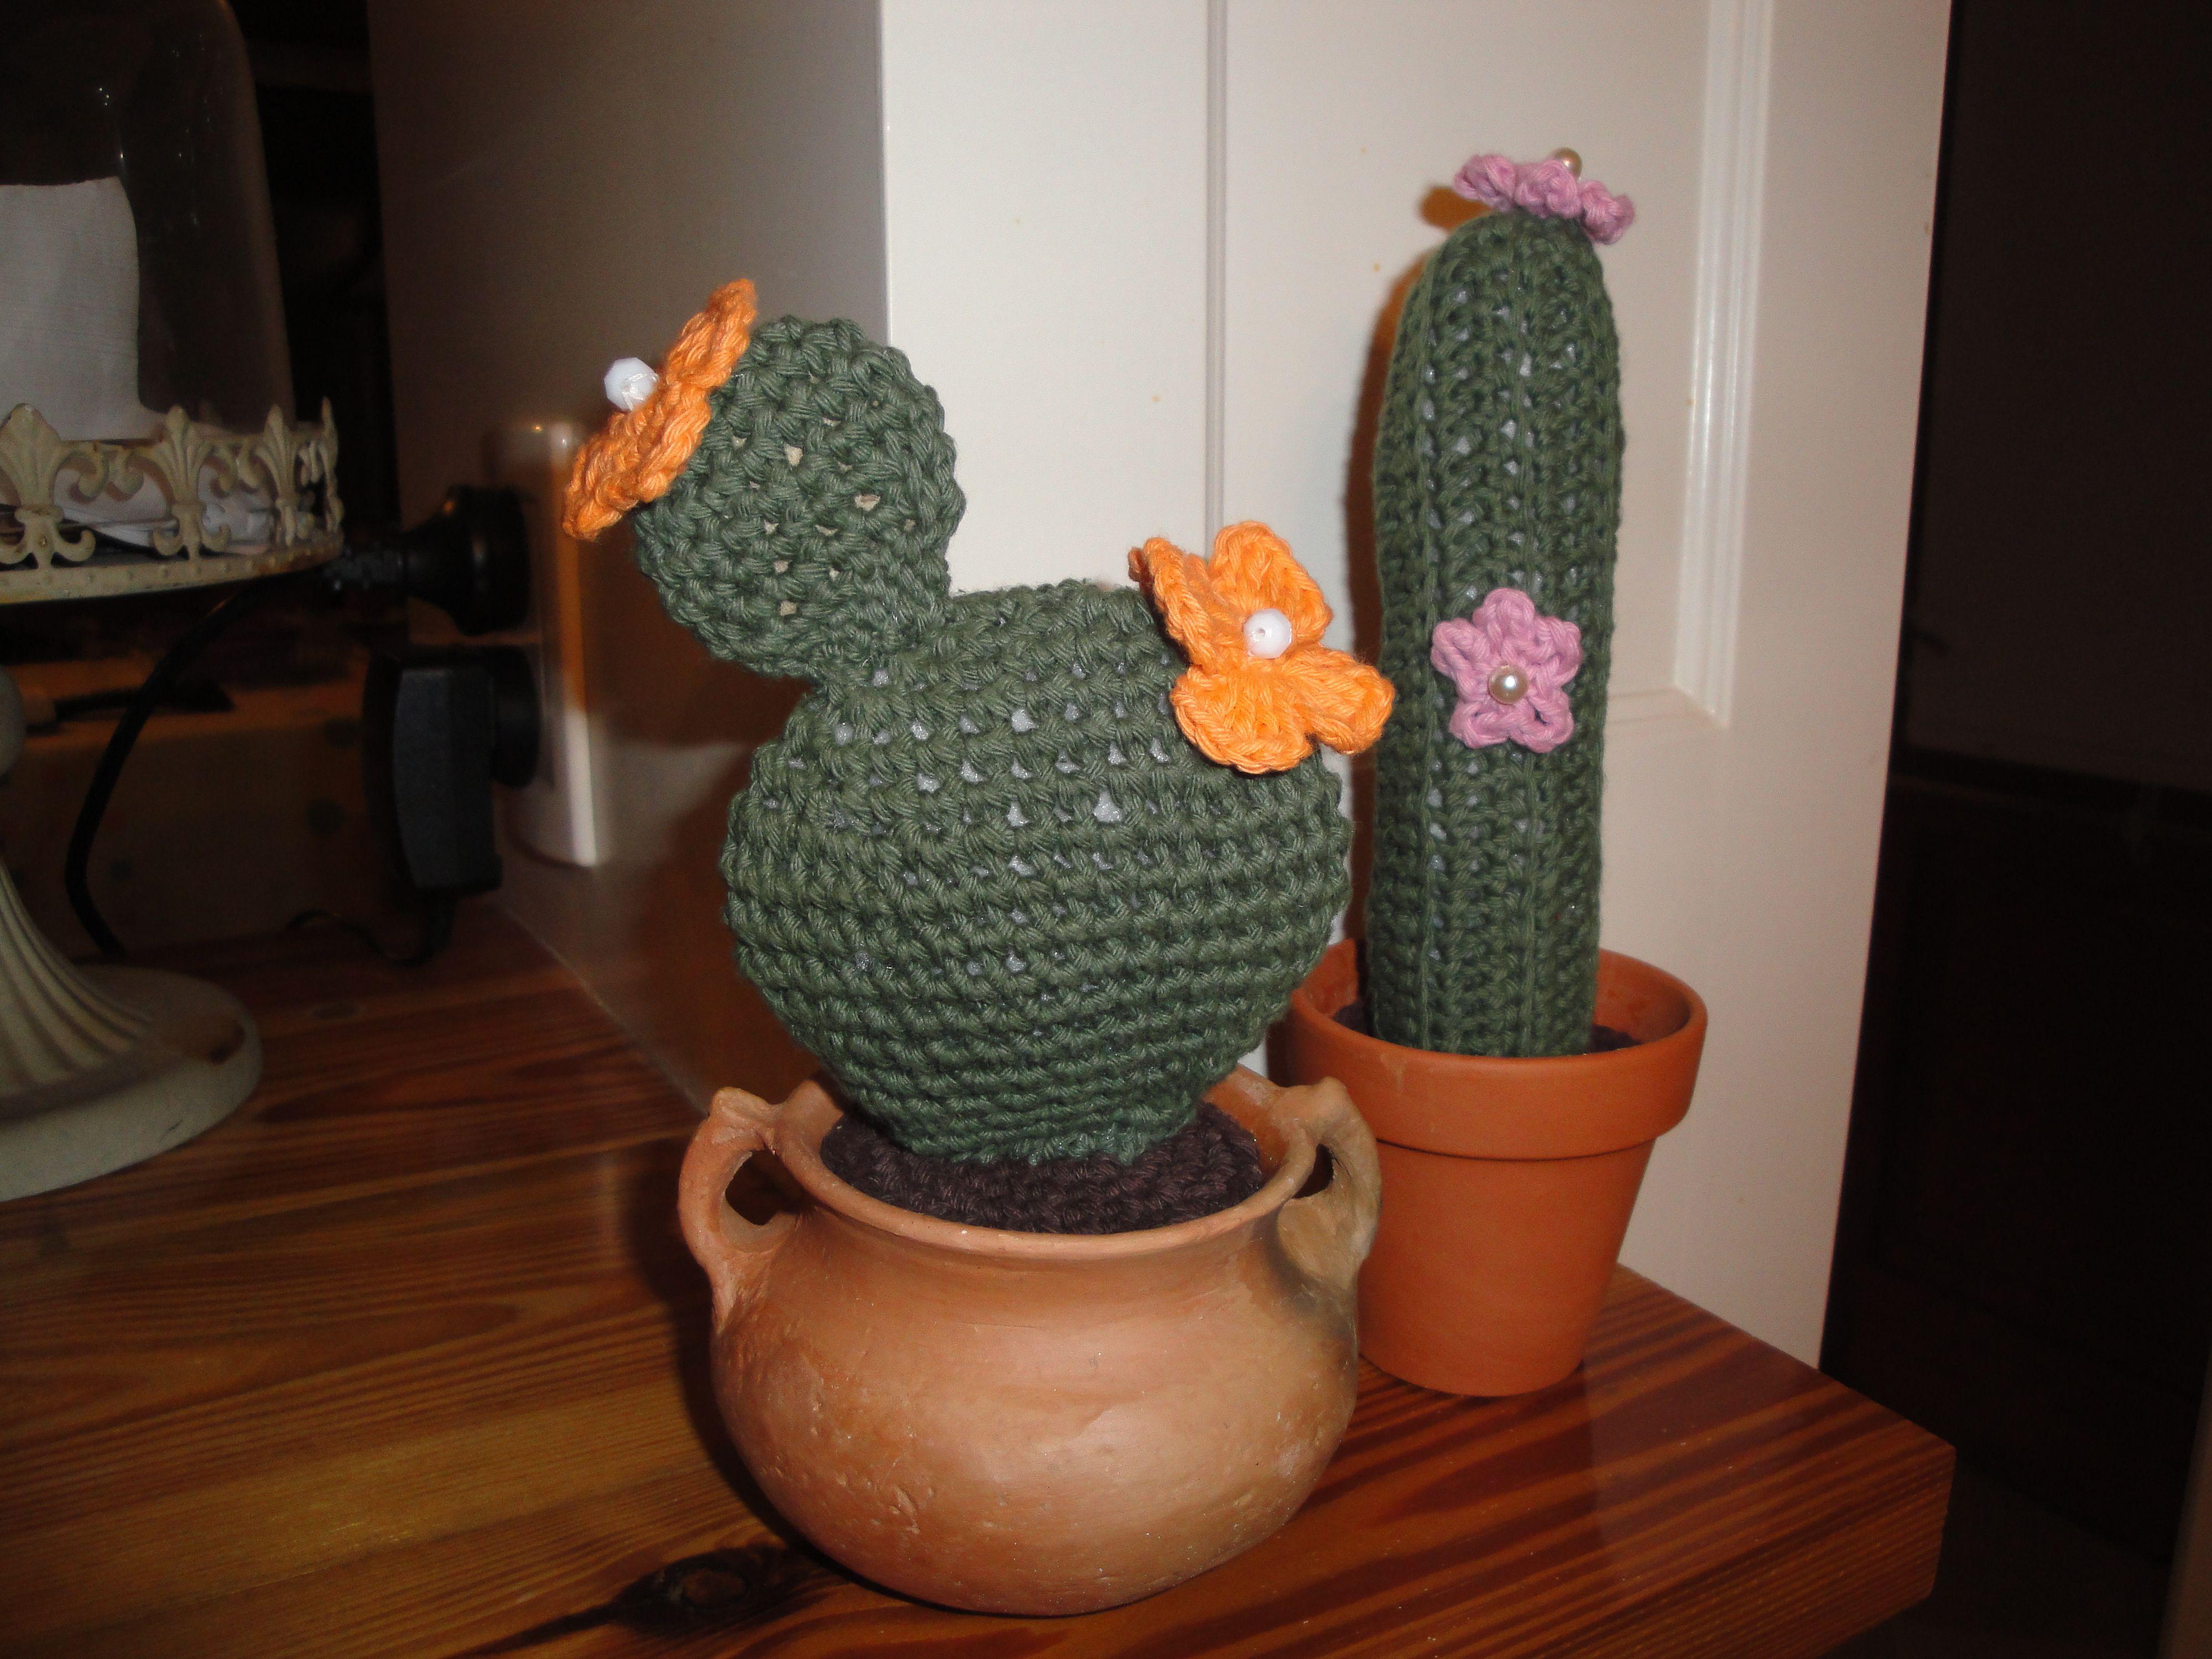 Amigurumi Cactus Tejido A Crochet Regalo Original : Made with this pattern besenseless spot